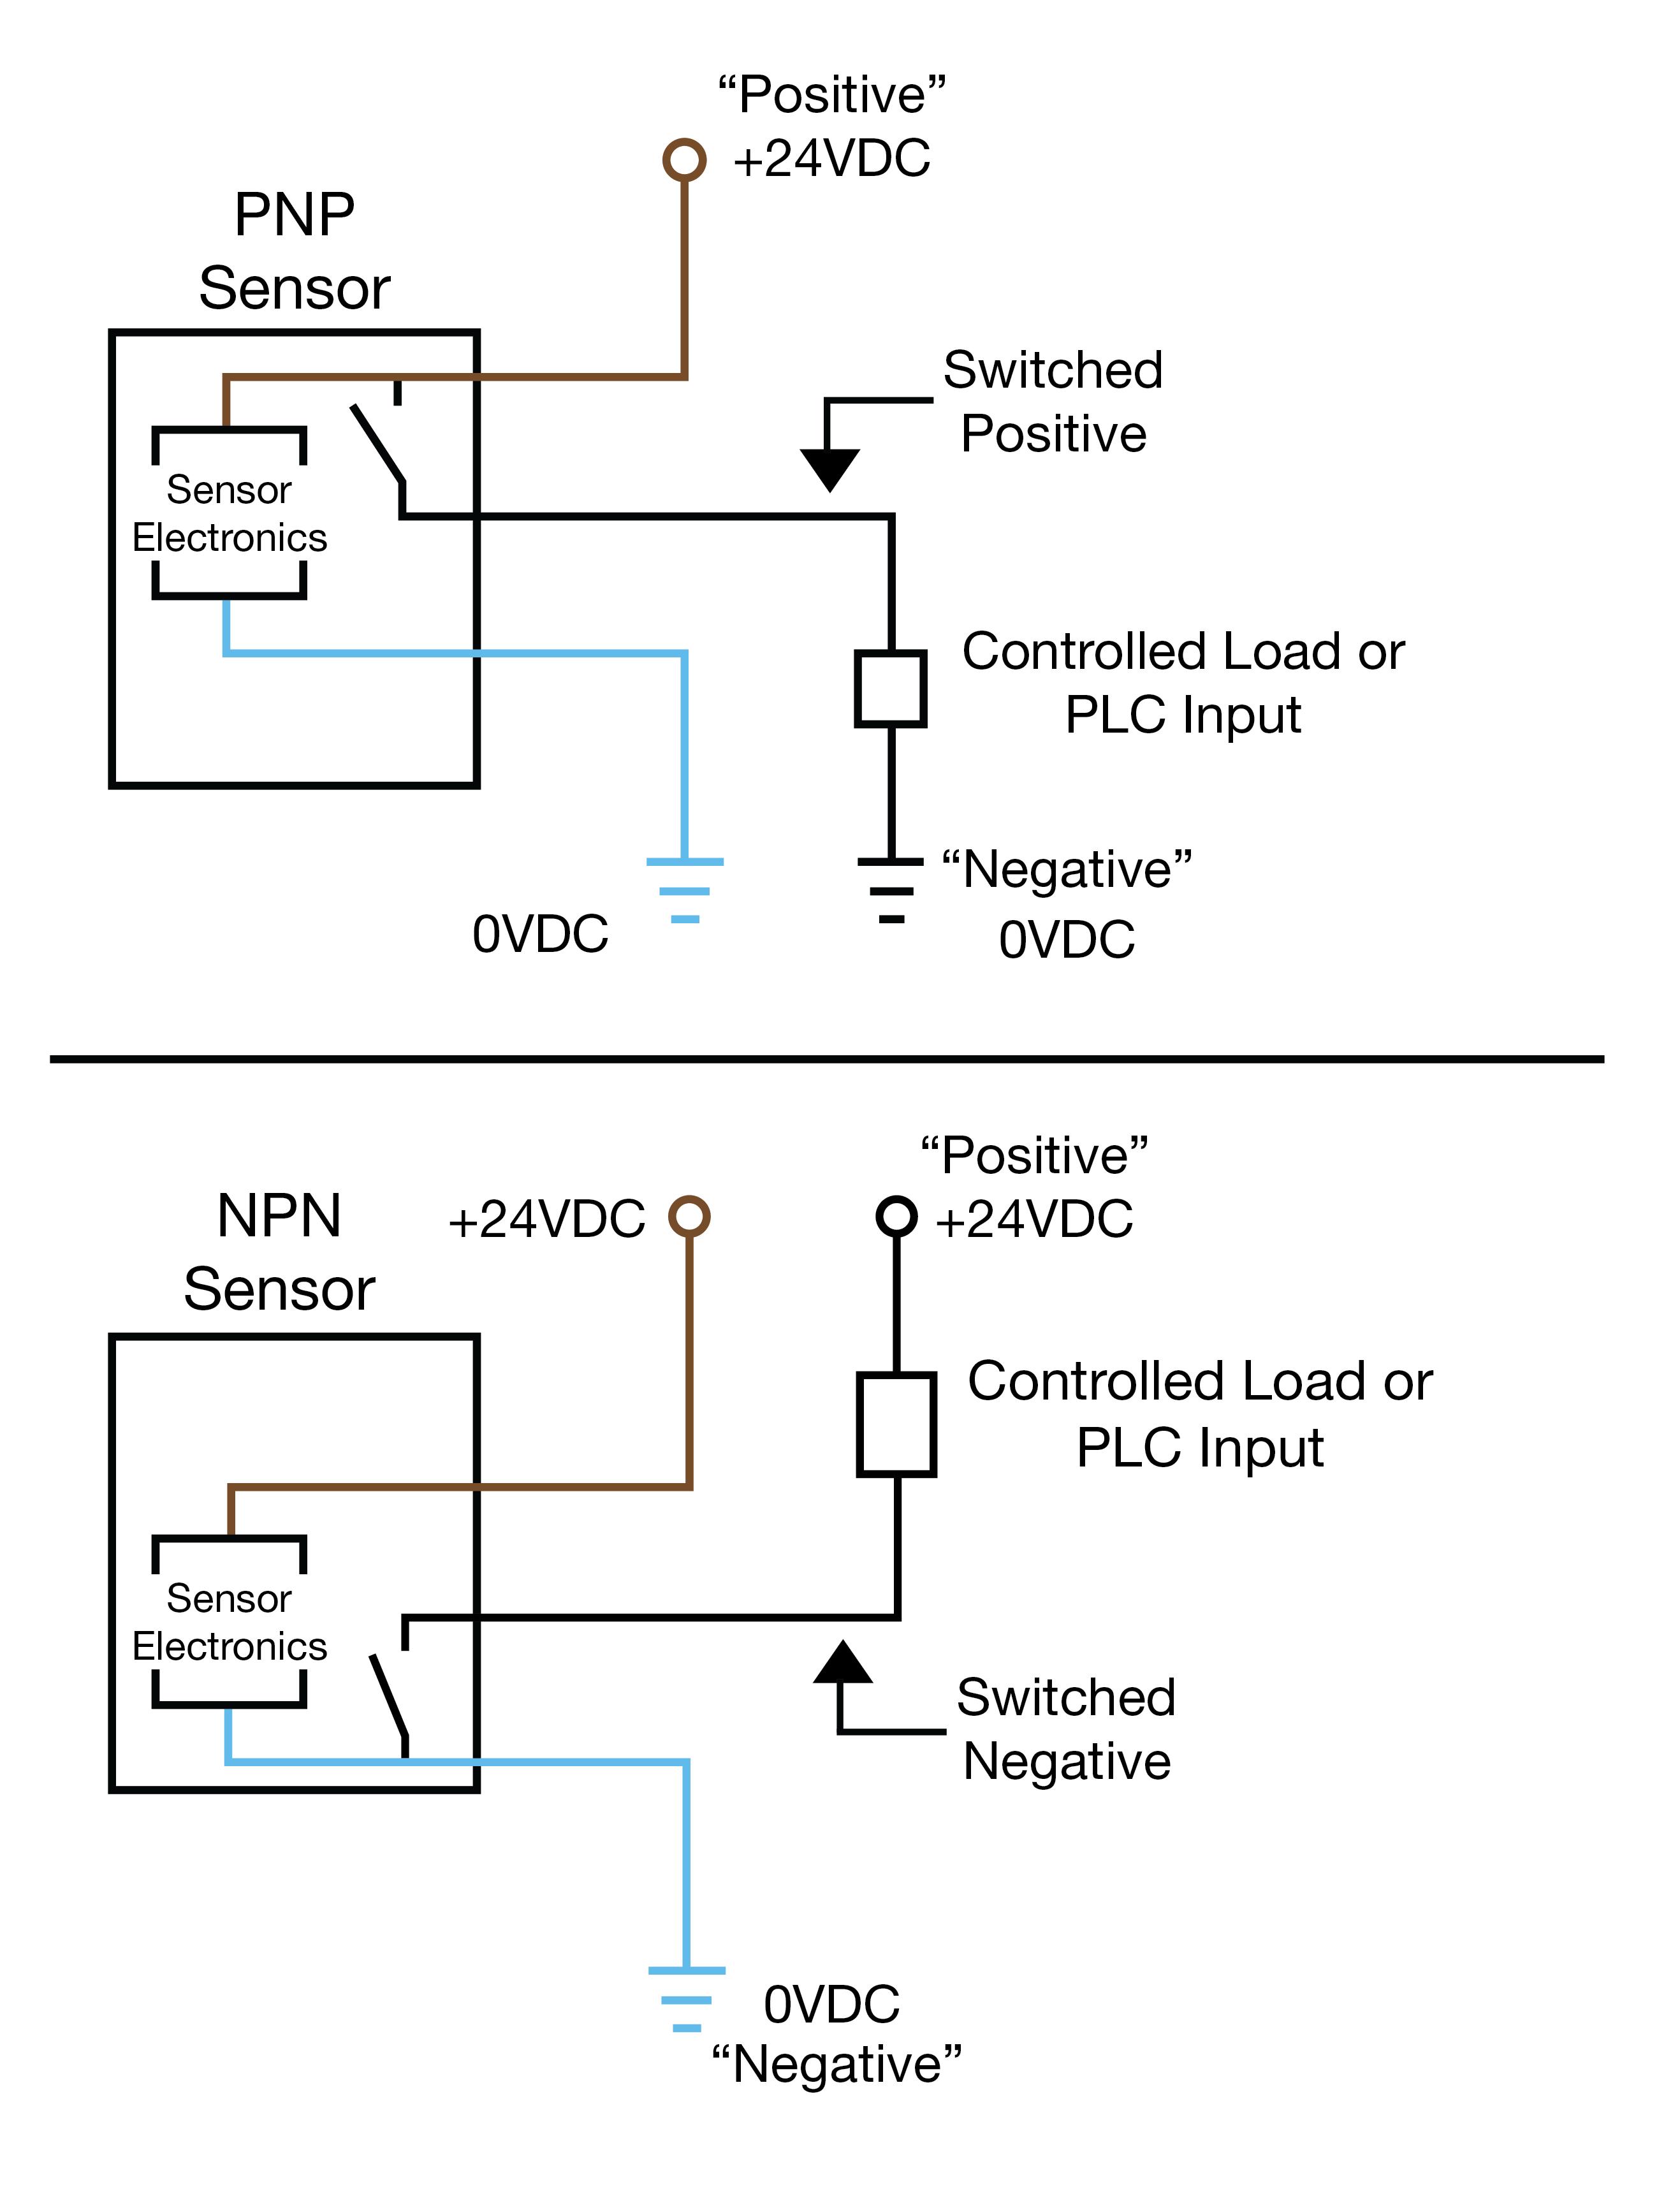 YA_7343] Plc Input Wiring Diagram Schematic WiringTivexi Tixat Mohammedshrine Librar Wiring 101